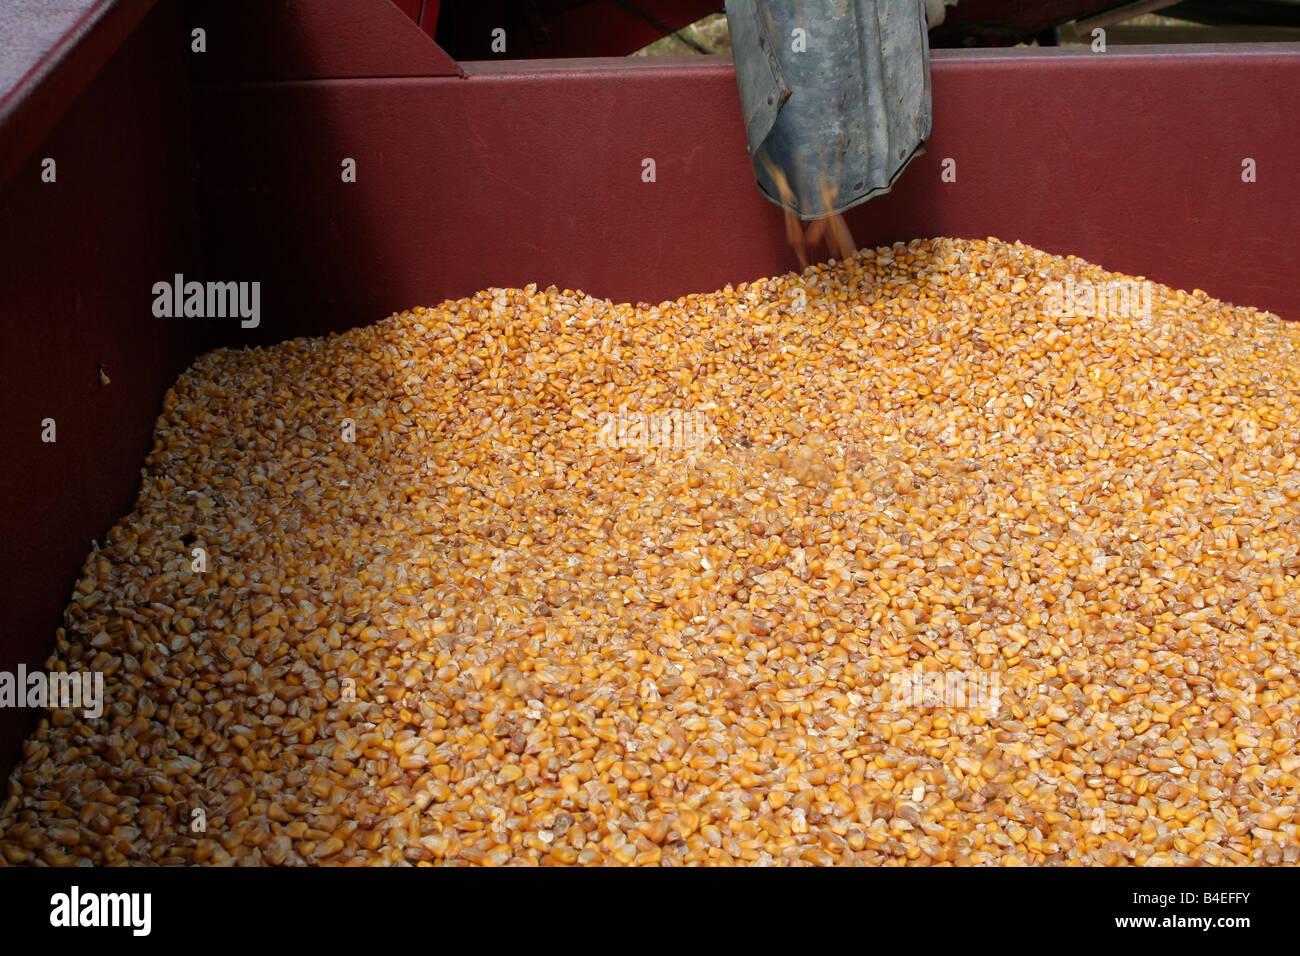 Shelled Corn Stock Photos & Shelled Corn Stock Images - Alamy